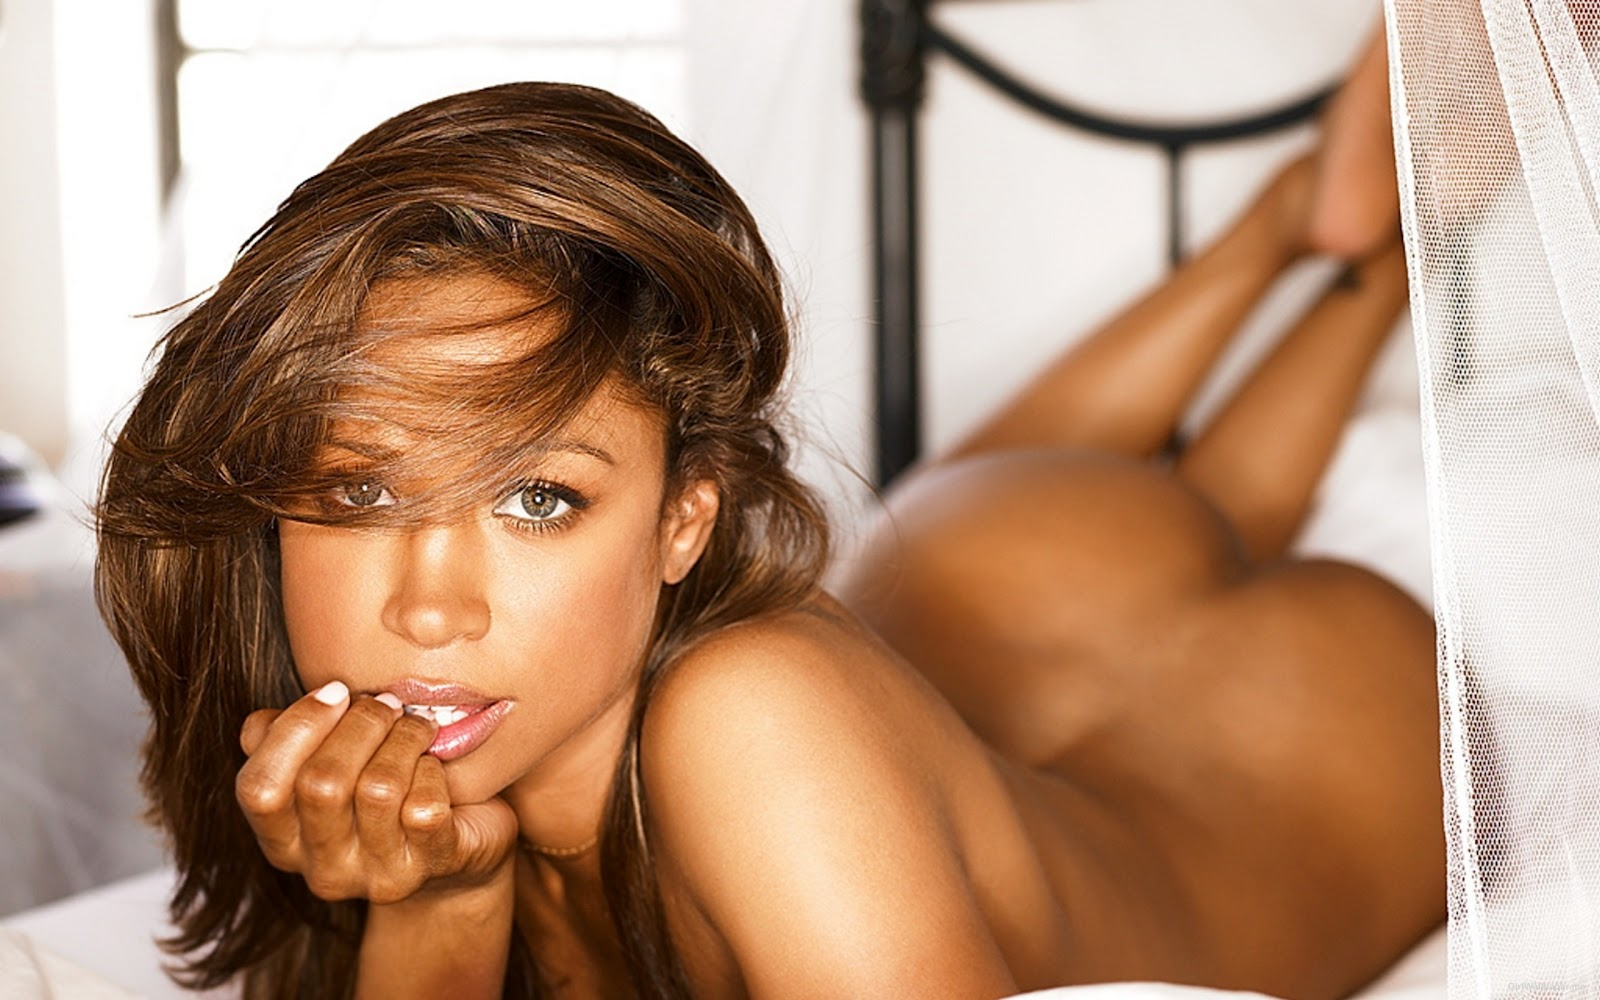 http://4.bp.blogspot.com/-oSCbNI3NKuA/T2GzM9S7hQI/AAAAAAAAV-I/Trq9eB5kDo4/s1600/Sexy-Stacey-Dash-2560x1600-24258.jpg